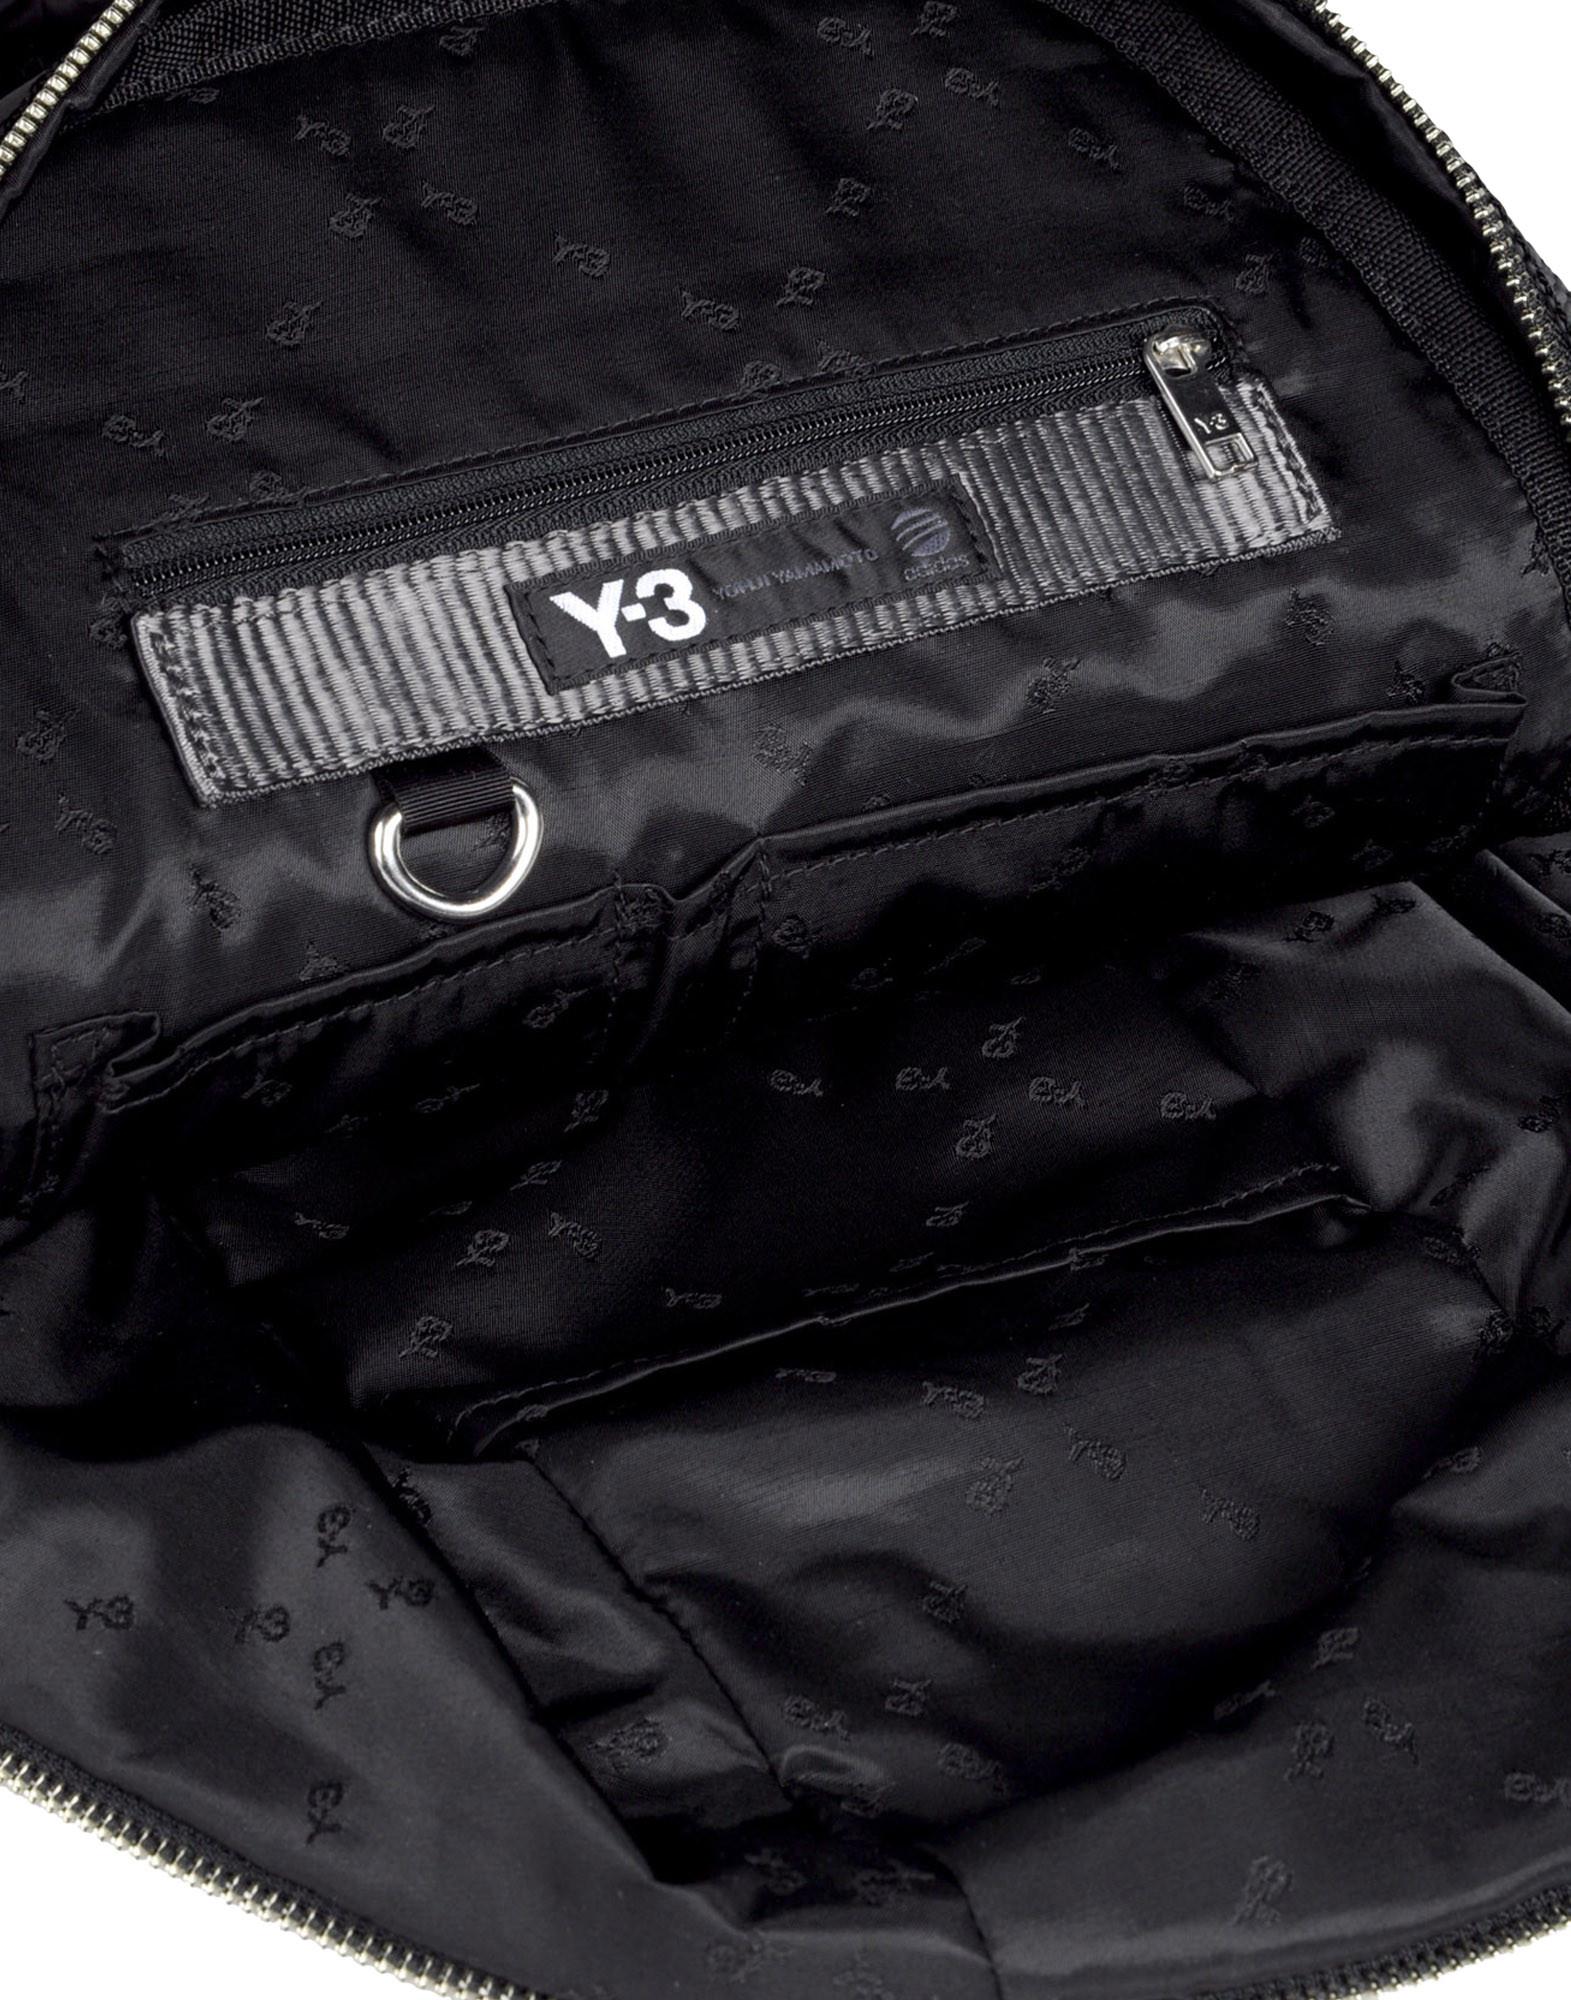 Y 3 Future Sport Backpack Backpacks   Adidas Y-3 ... 875f58cdae